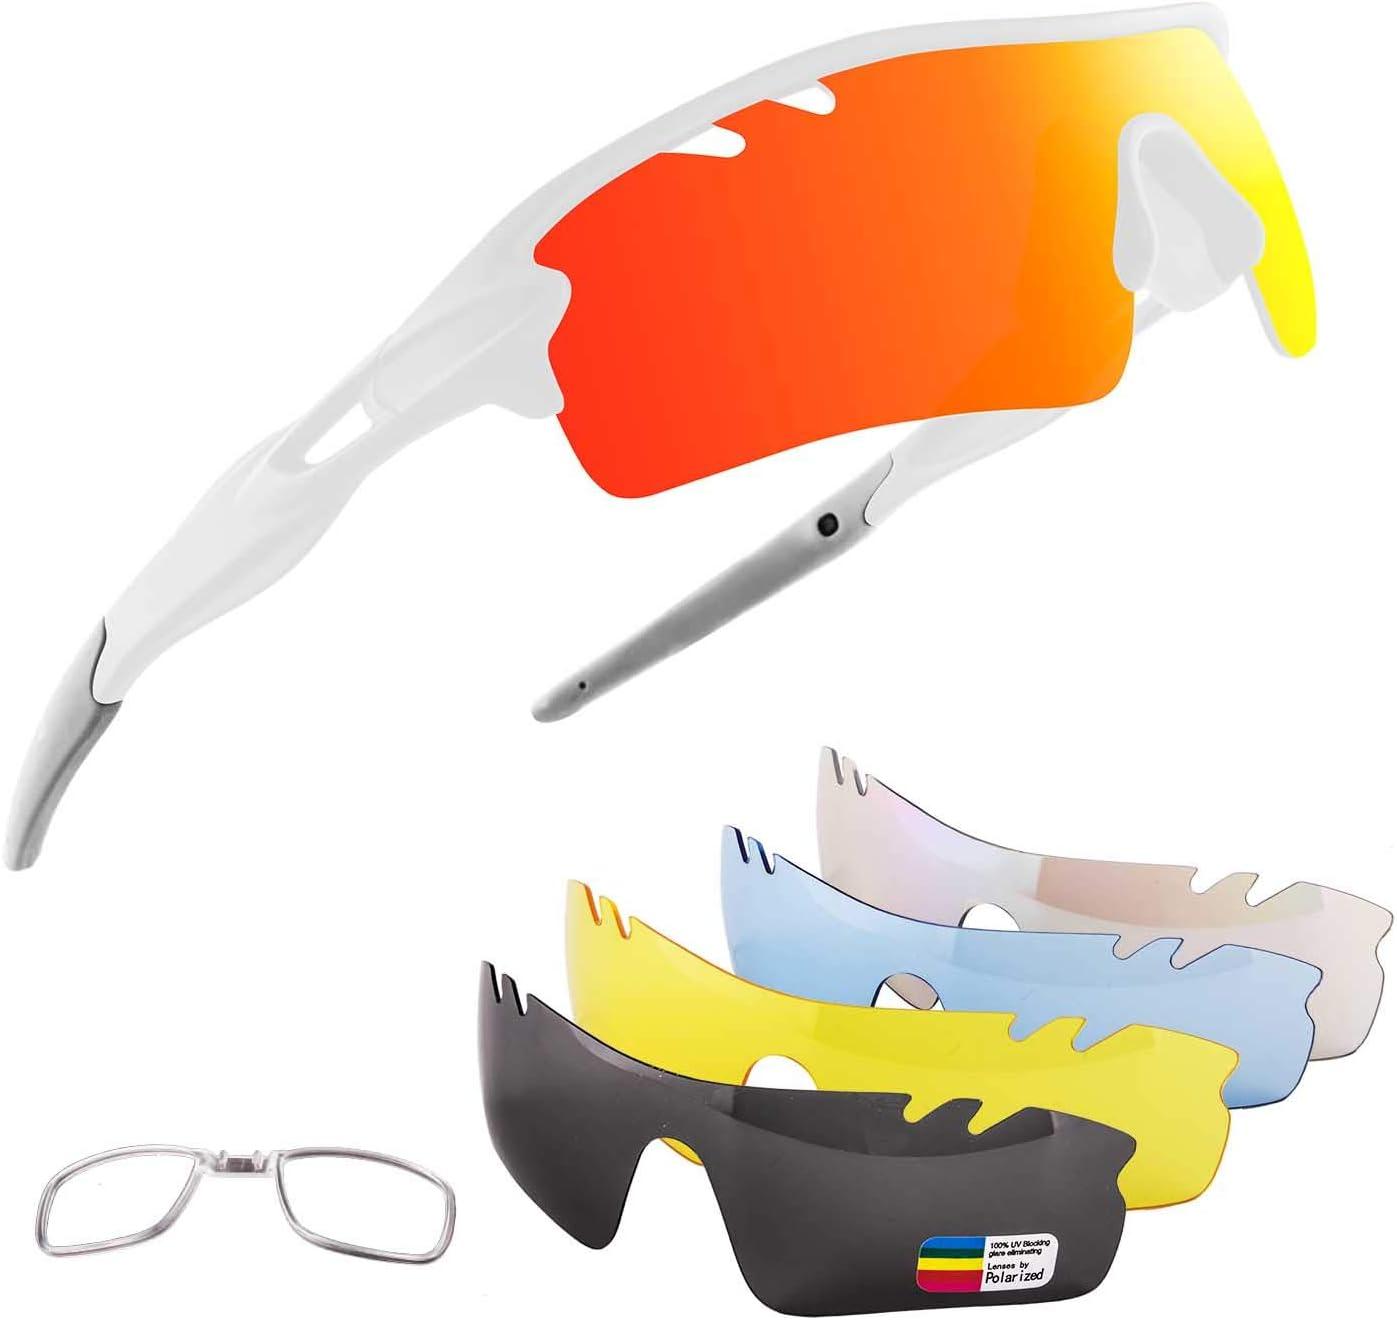 OULIQI Gafas De Sol Polarizadas para Ciclismo con 5 Lentes Intercambiables UV400 Y Montura De, Gafas para MTB Bicicleta Montaña 100% De Protección UV